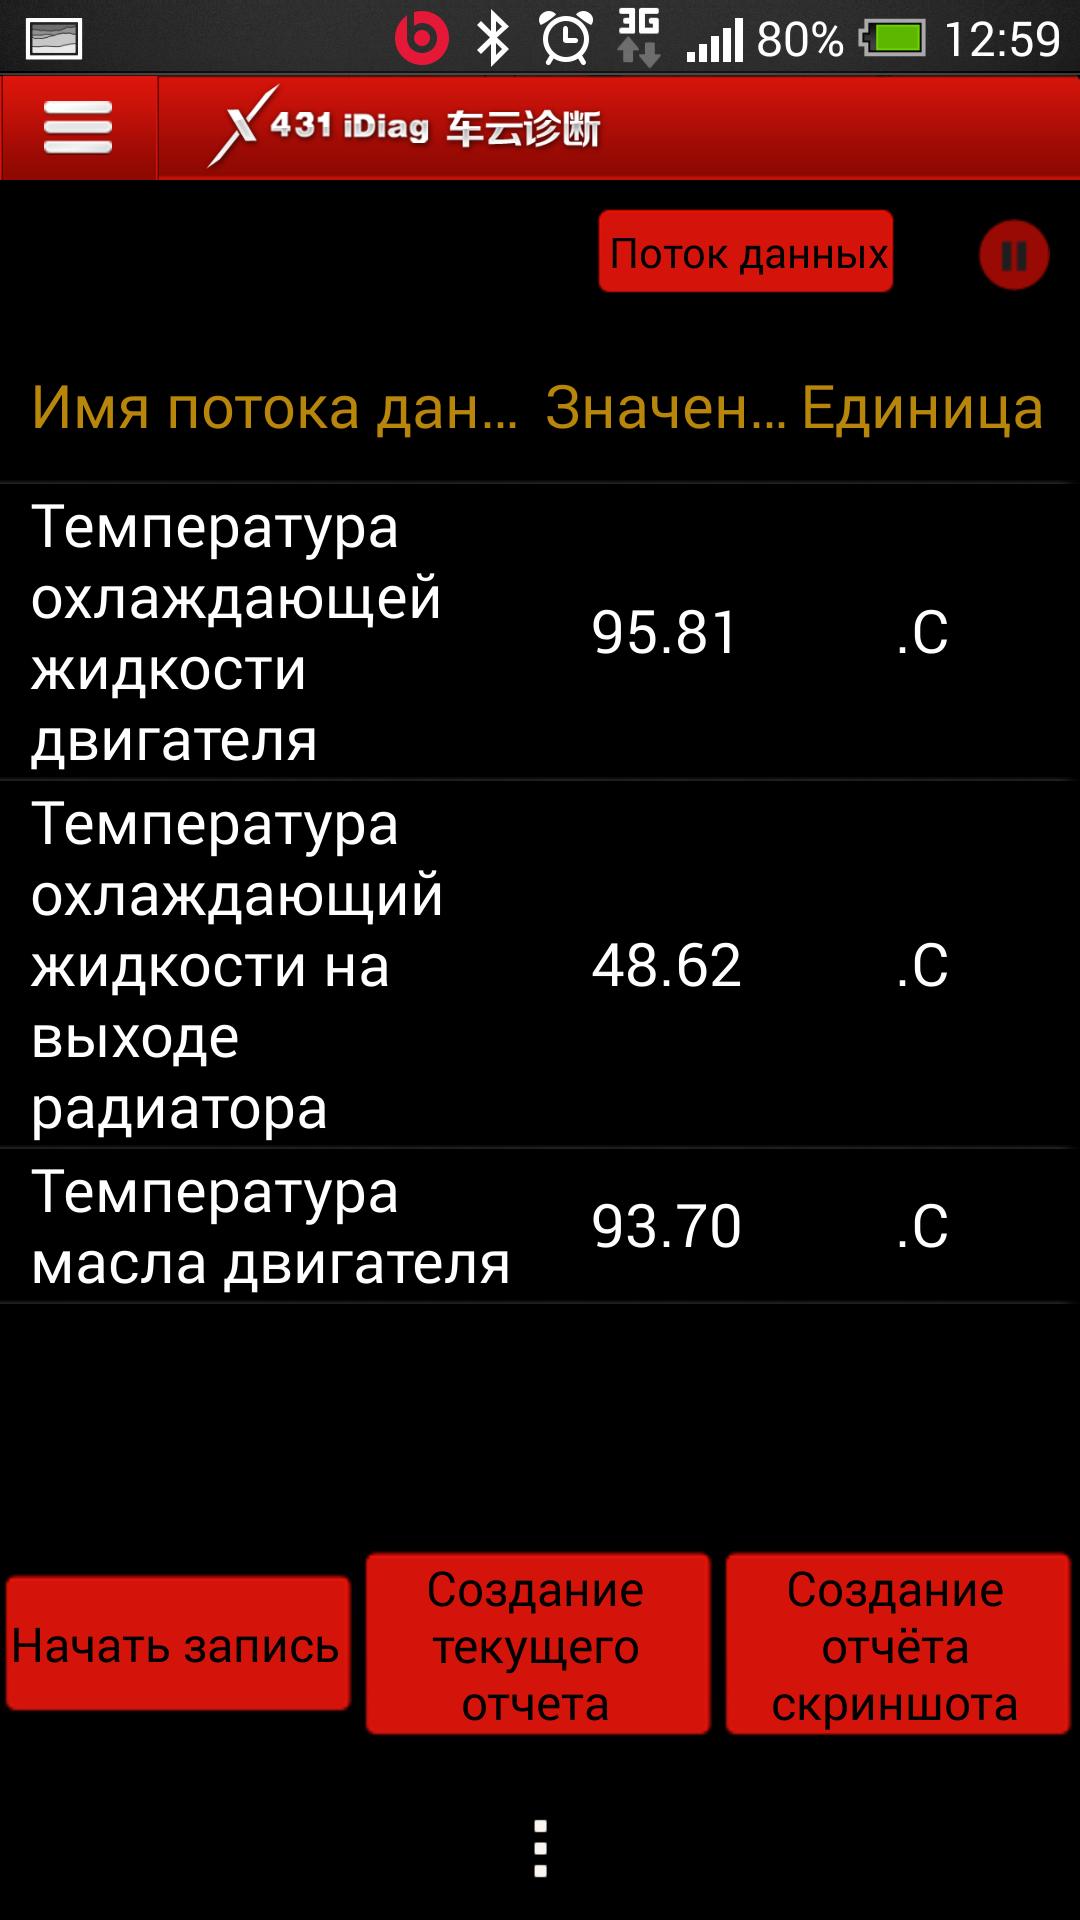 Screenshot_2021-01-25-12-59-26